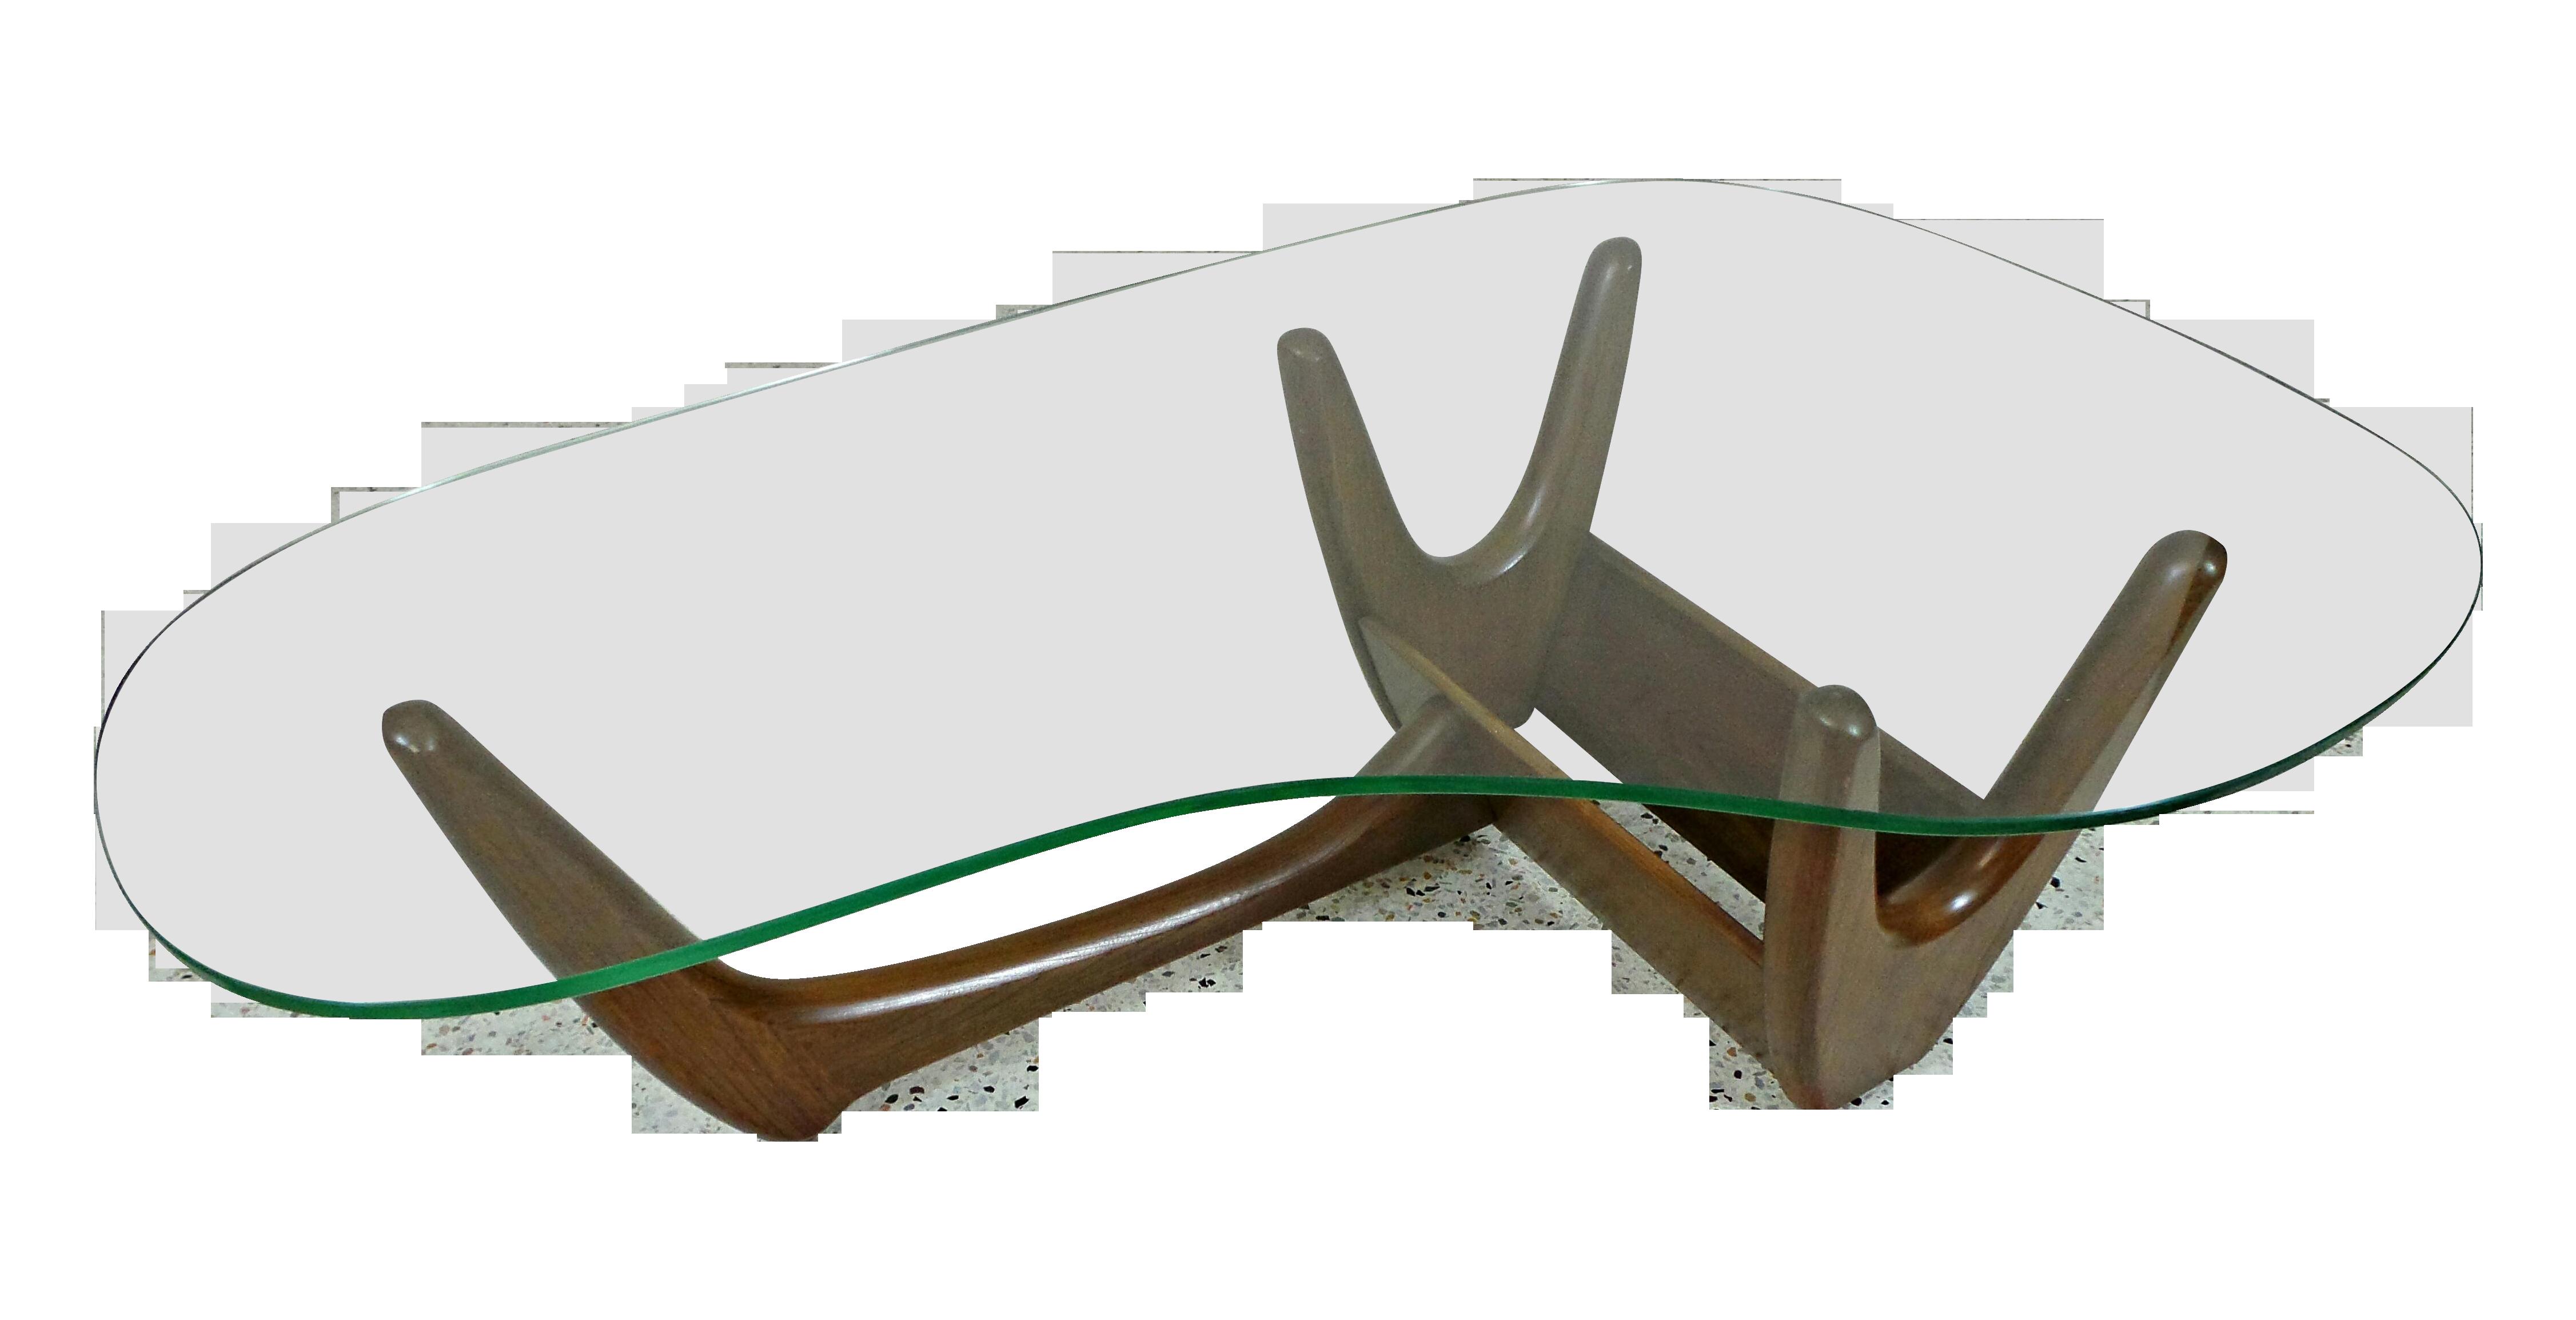 Adrian Pearsall Kidney Glass Walnut Coffee Table Coffee Table Walnut Coffee Table Wood Table Bases [ 2309 x 4506 Pixel ]